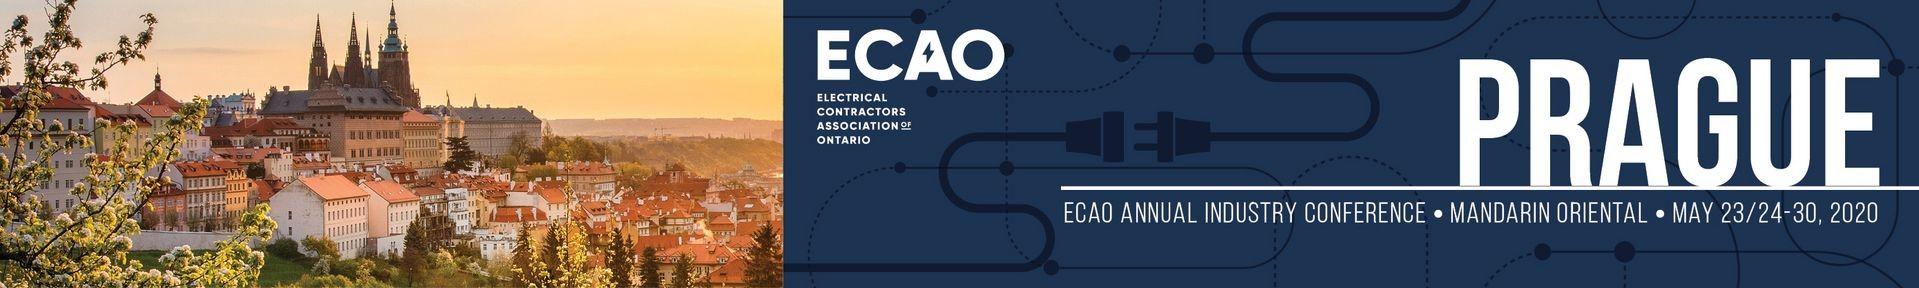 ecao1feb42020.jpg